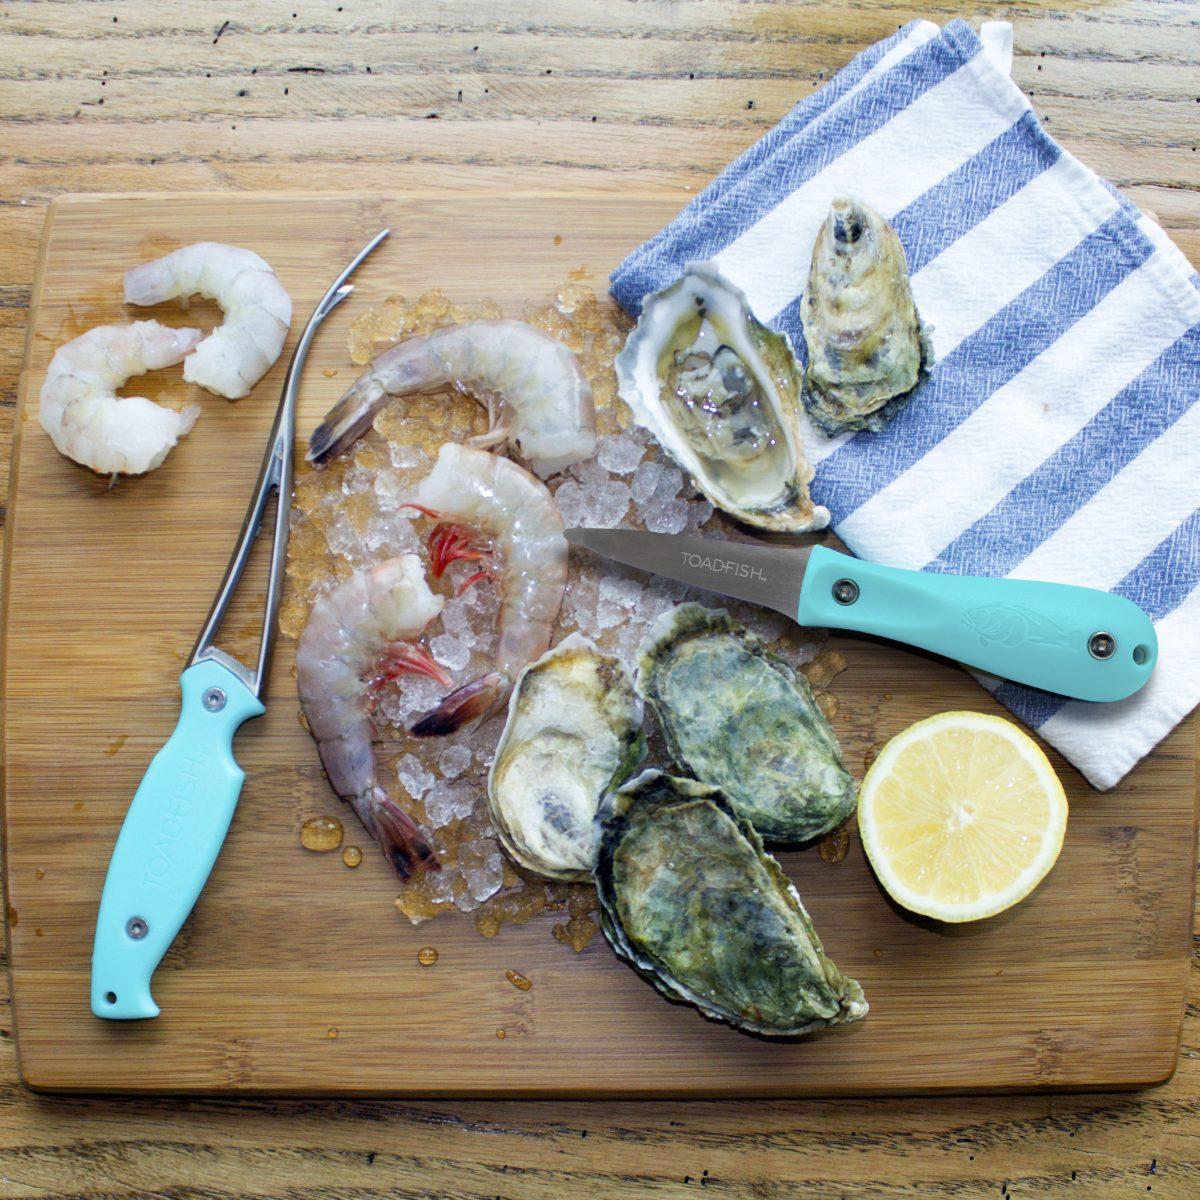 toadfish shrimp oyster tools